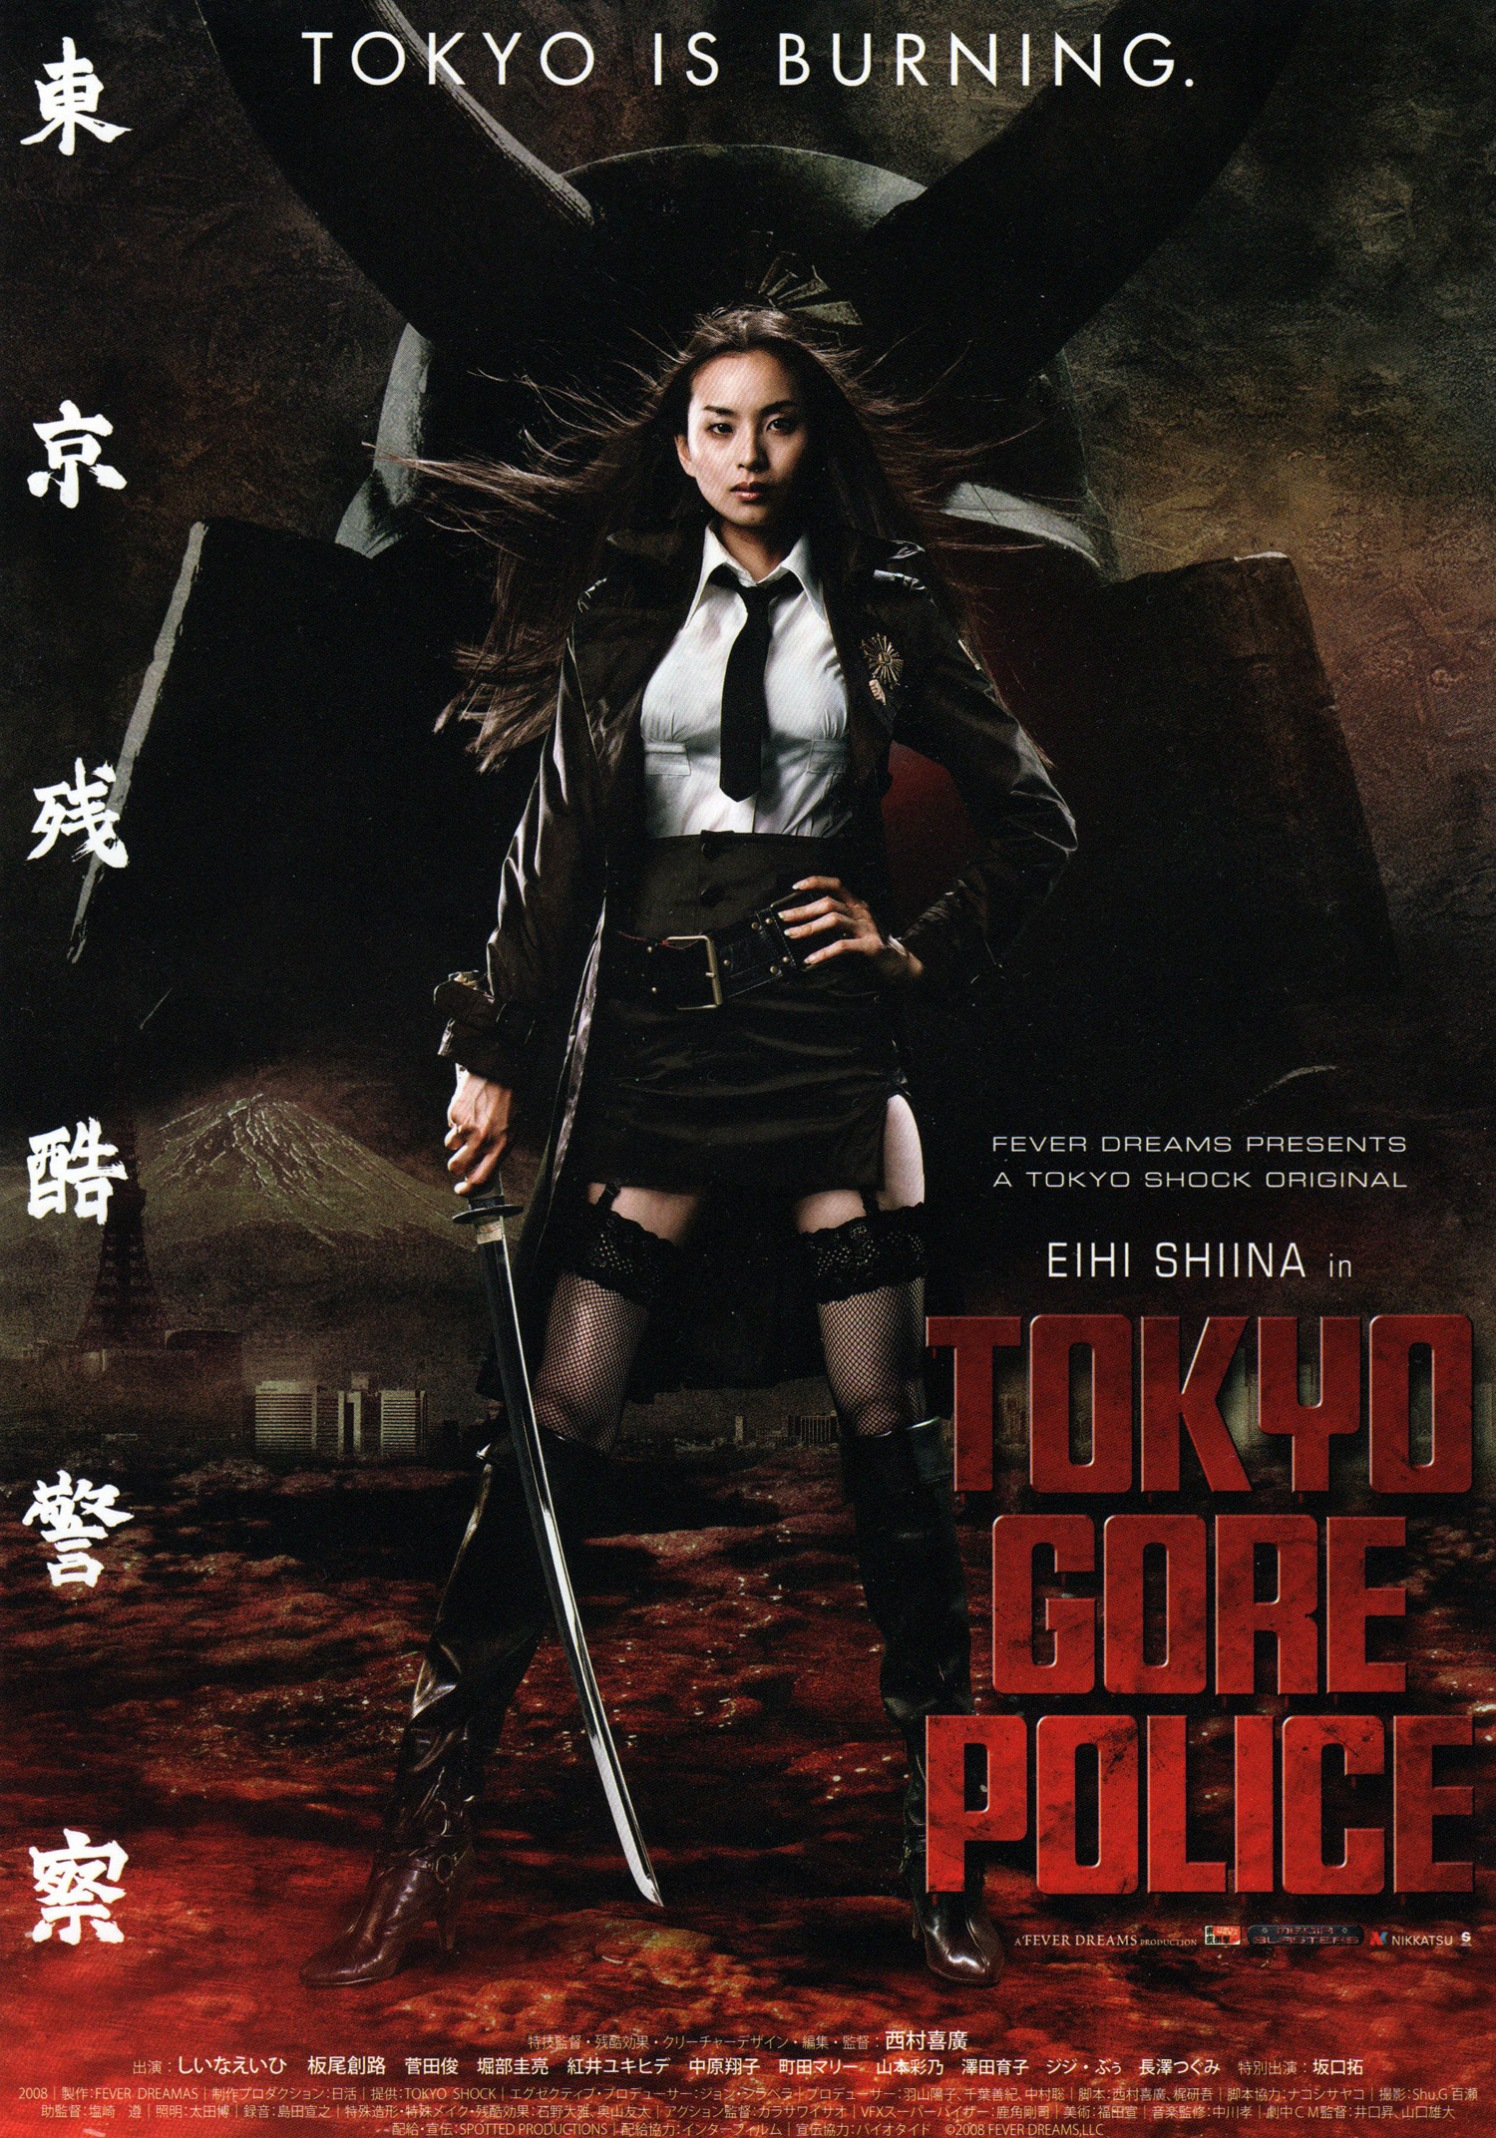 tokyogorepolice-japan2-1-1